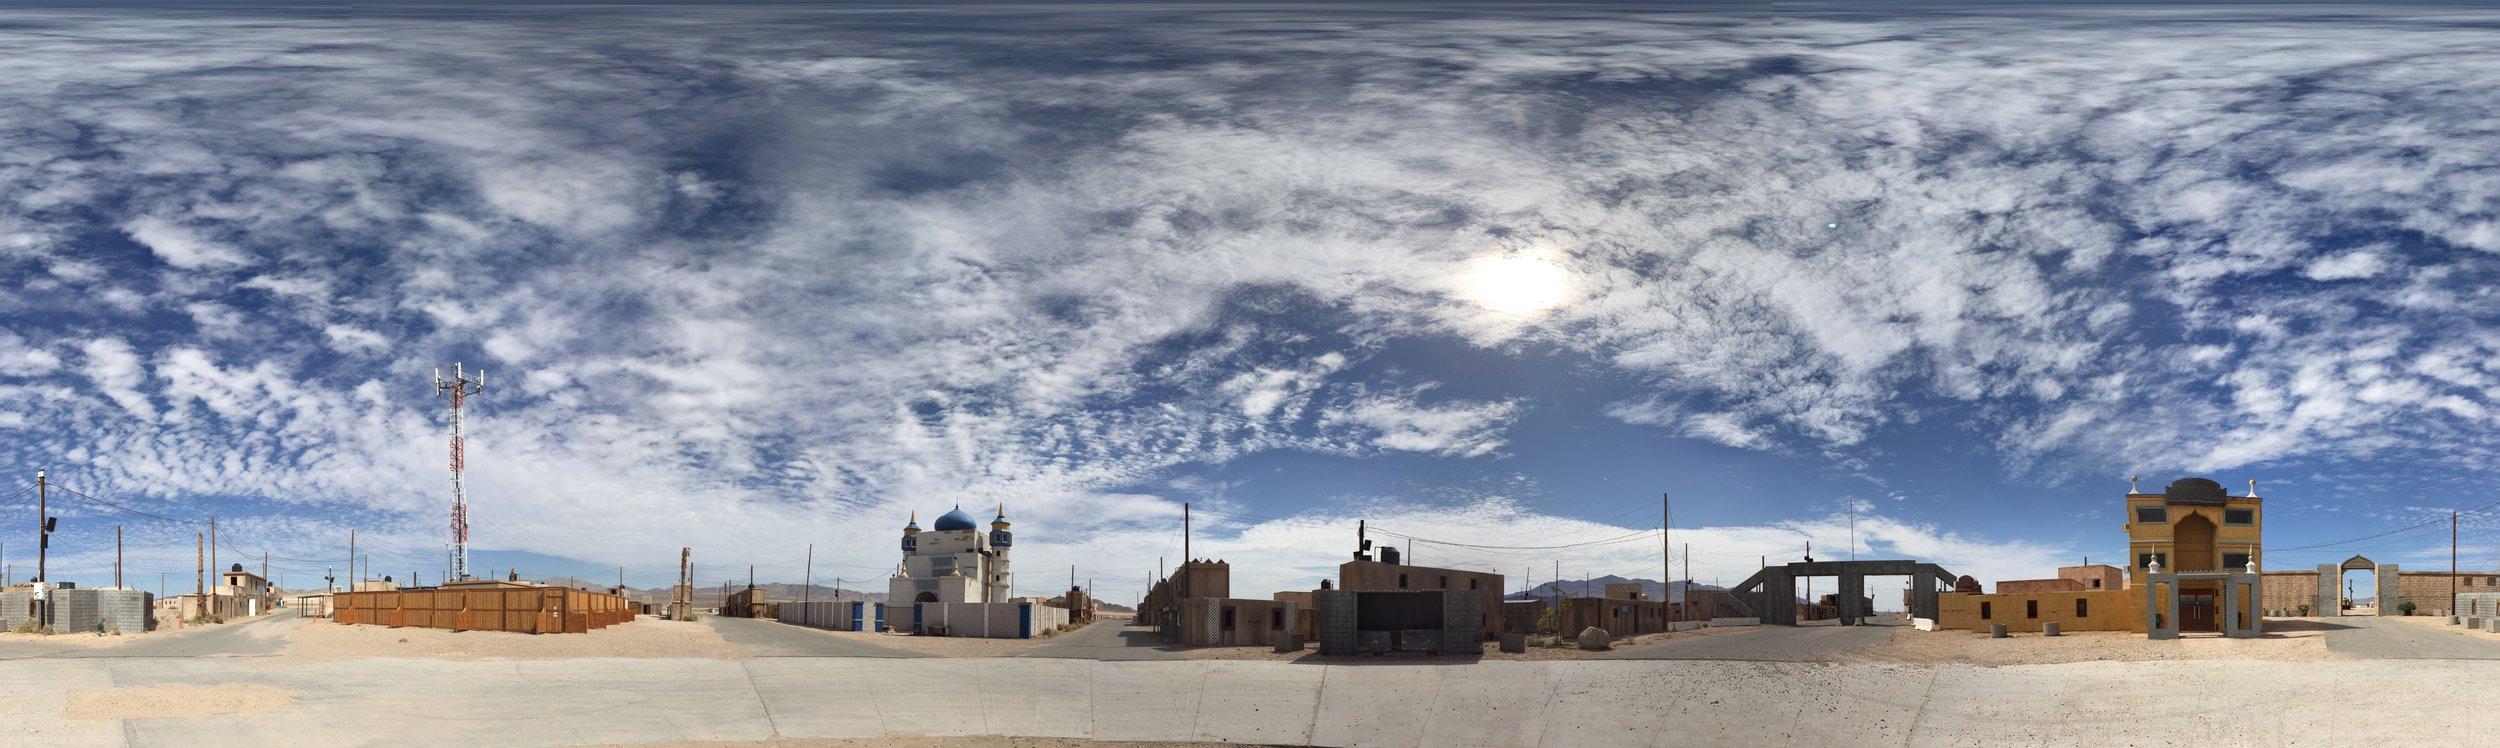 Medina Wasl VIllage  AKA  Ujen —  extracted Google Street View panorama by Pat Ripton